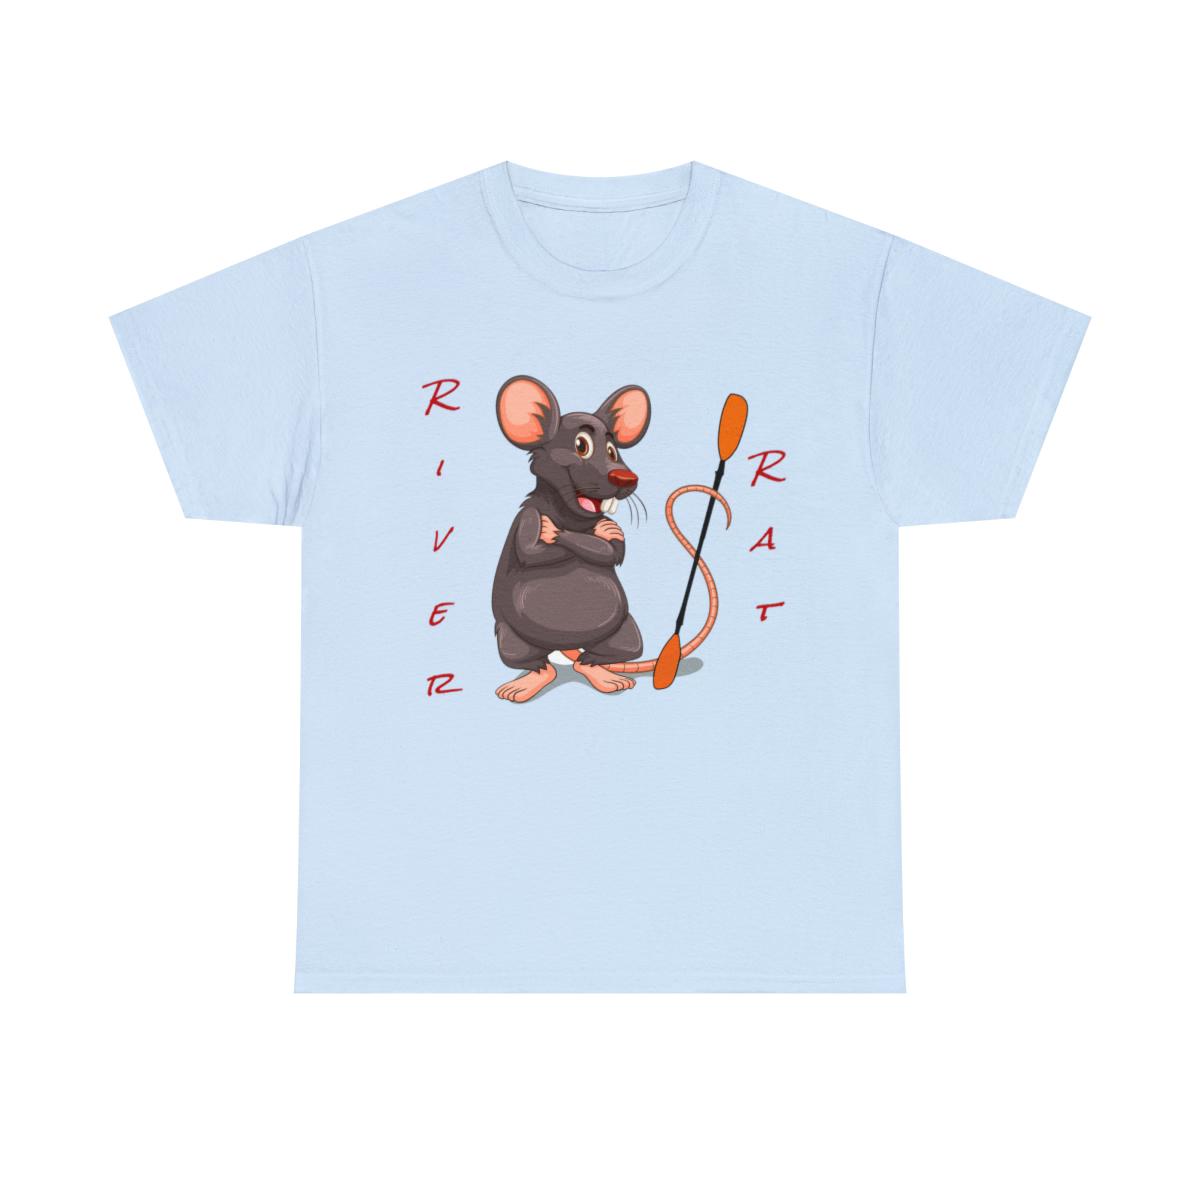 Happy-River-Rats-Kayak-T-Shirt-Unisex-Heavy-Cotton-Tee thumbnail 3